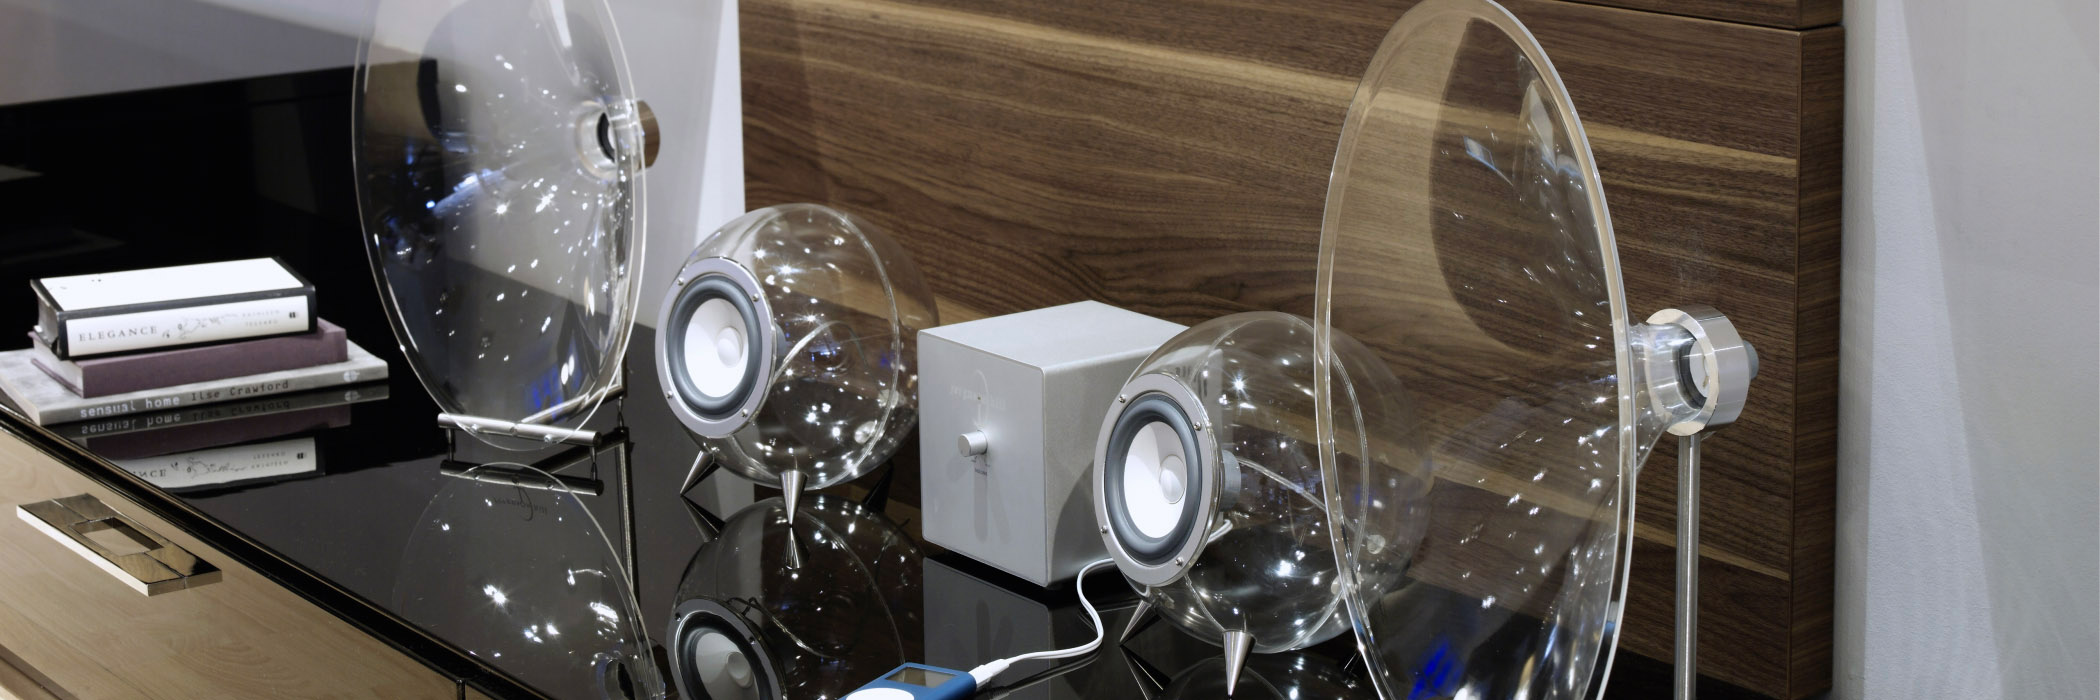 FH007 + iPod